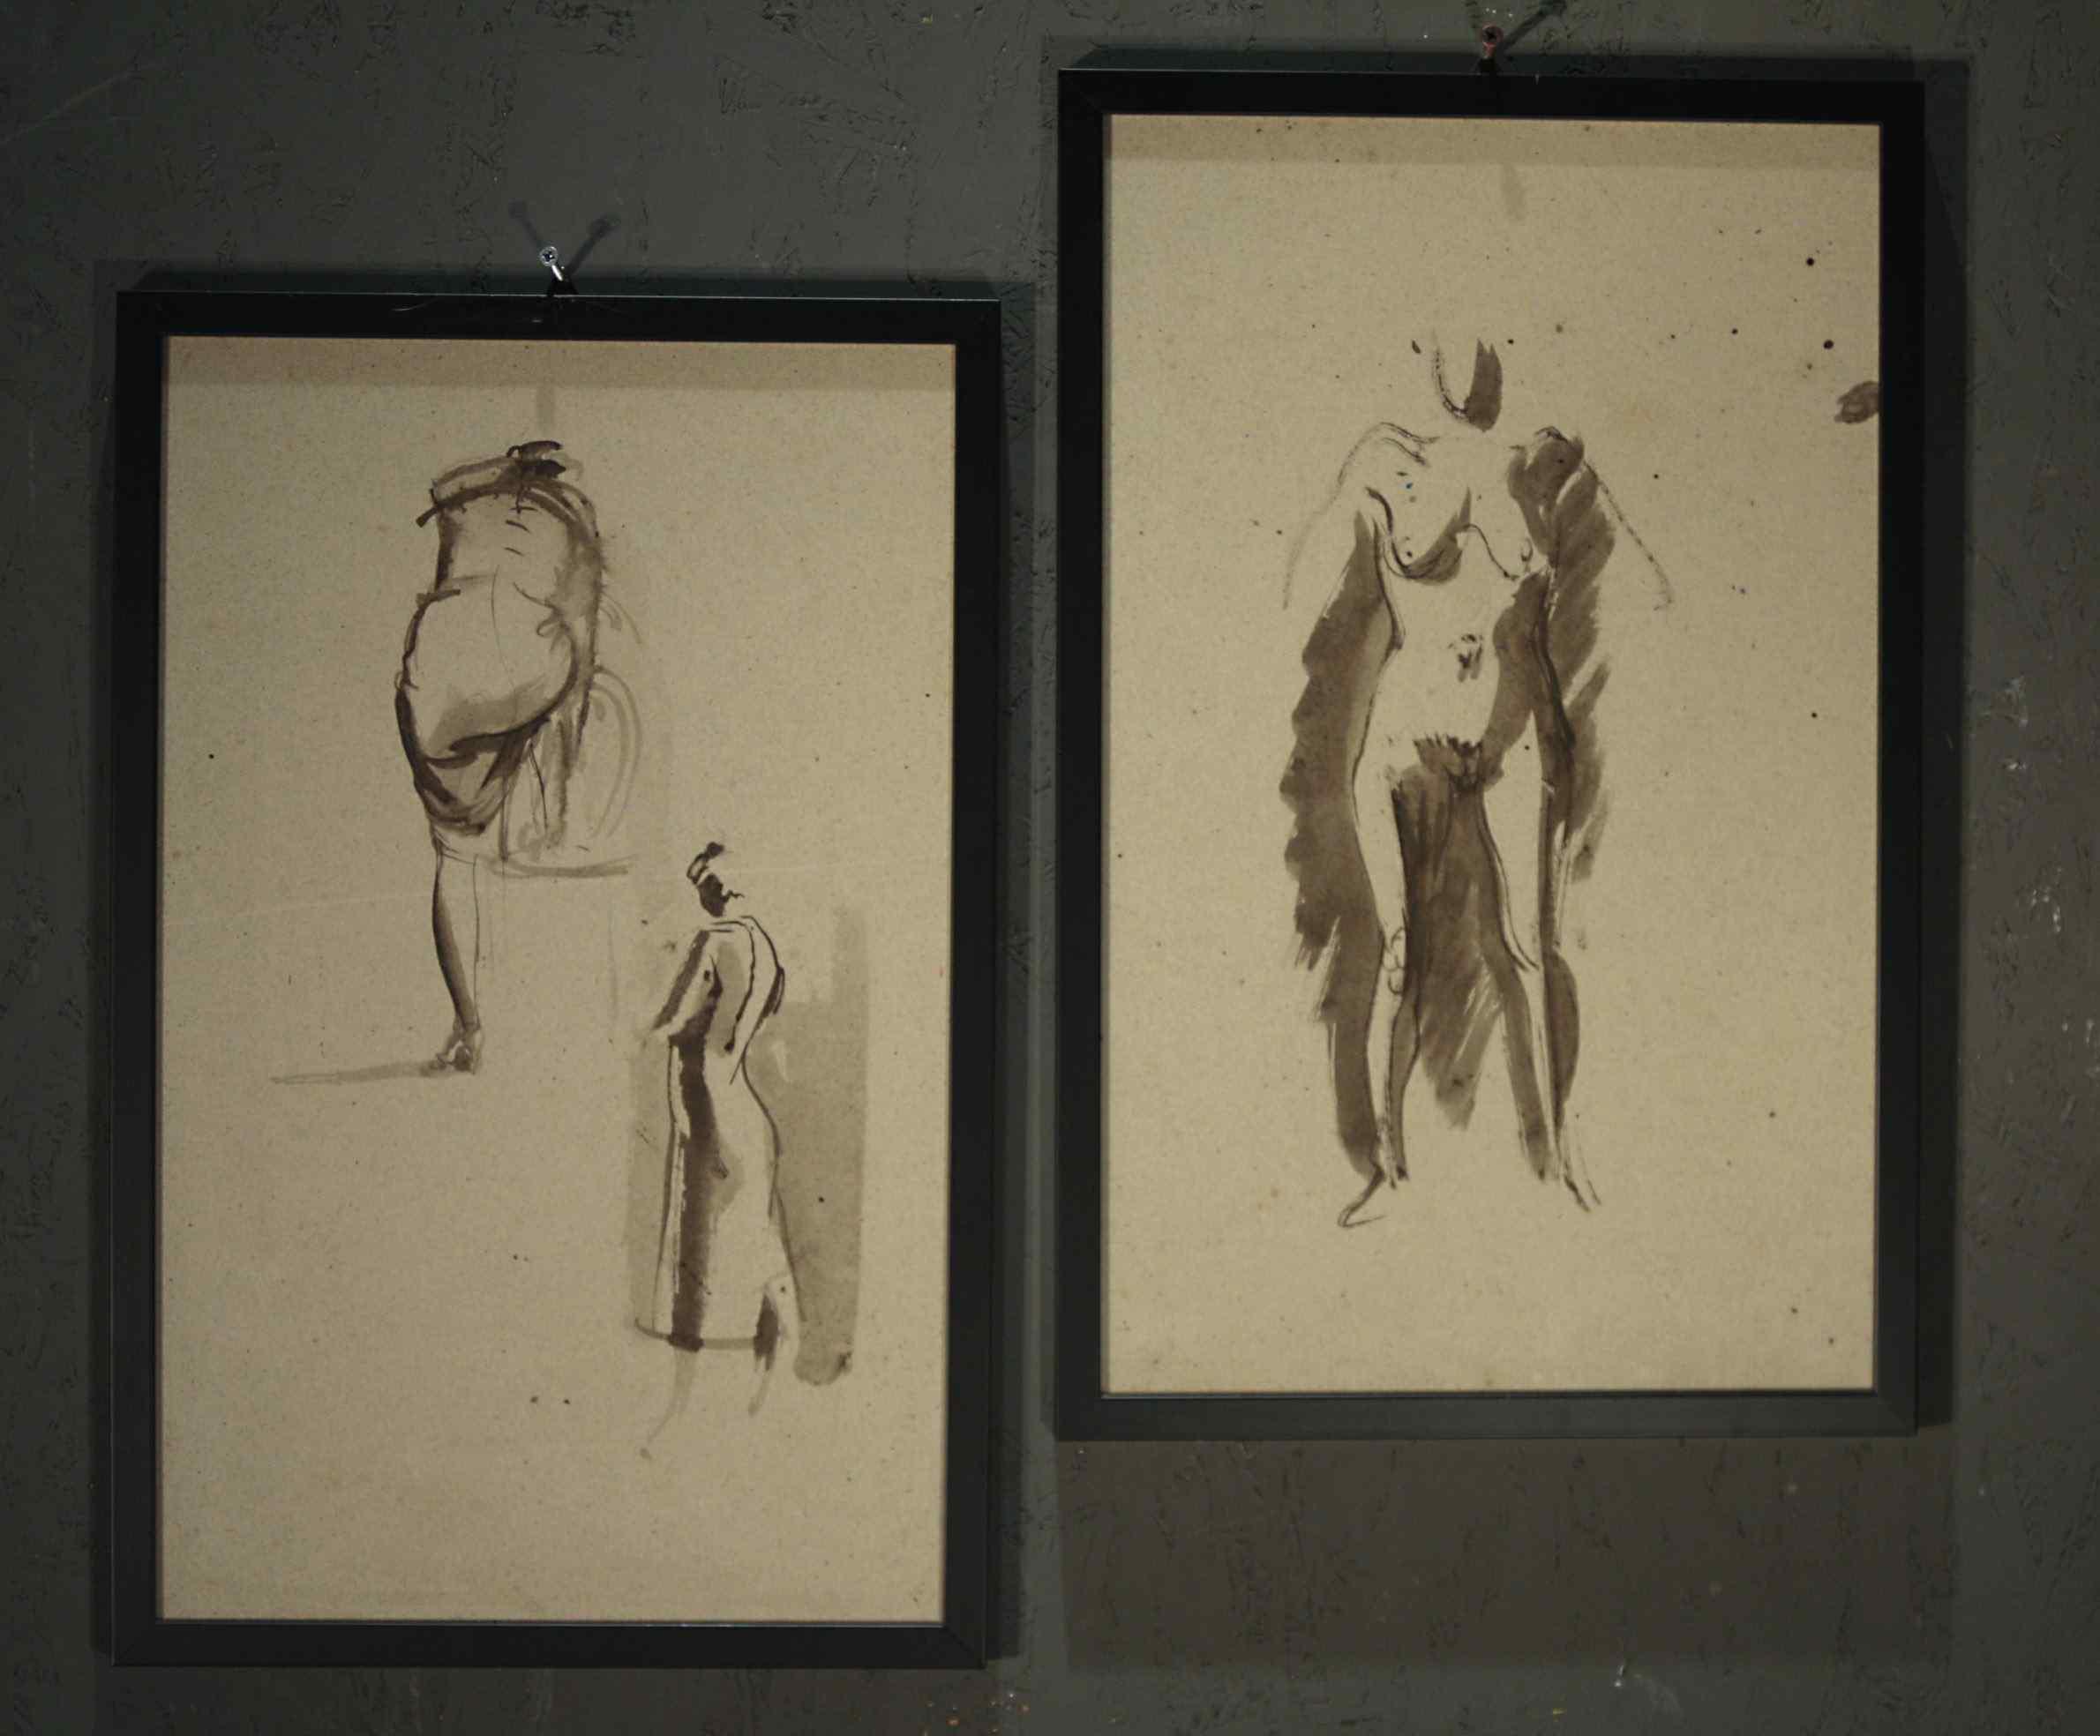 Pietro Annigoni (Milan1910-Florence1988) -Couple of watercol